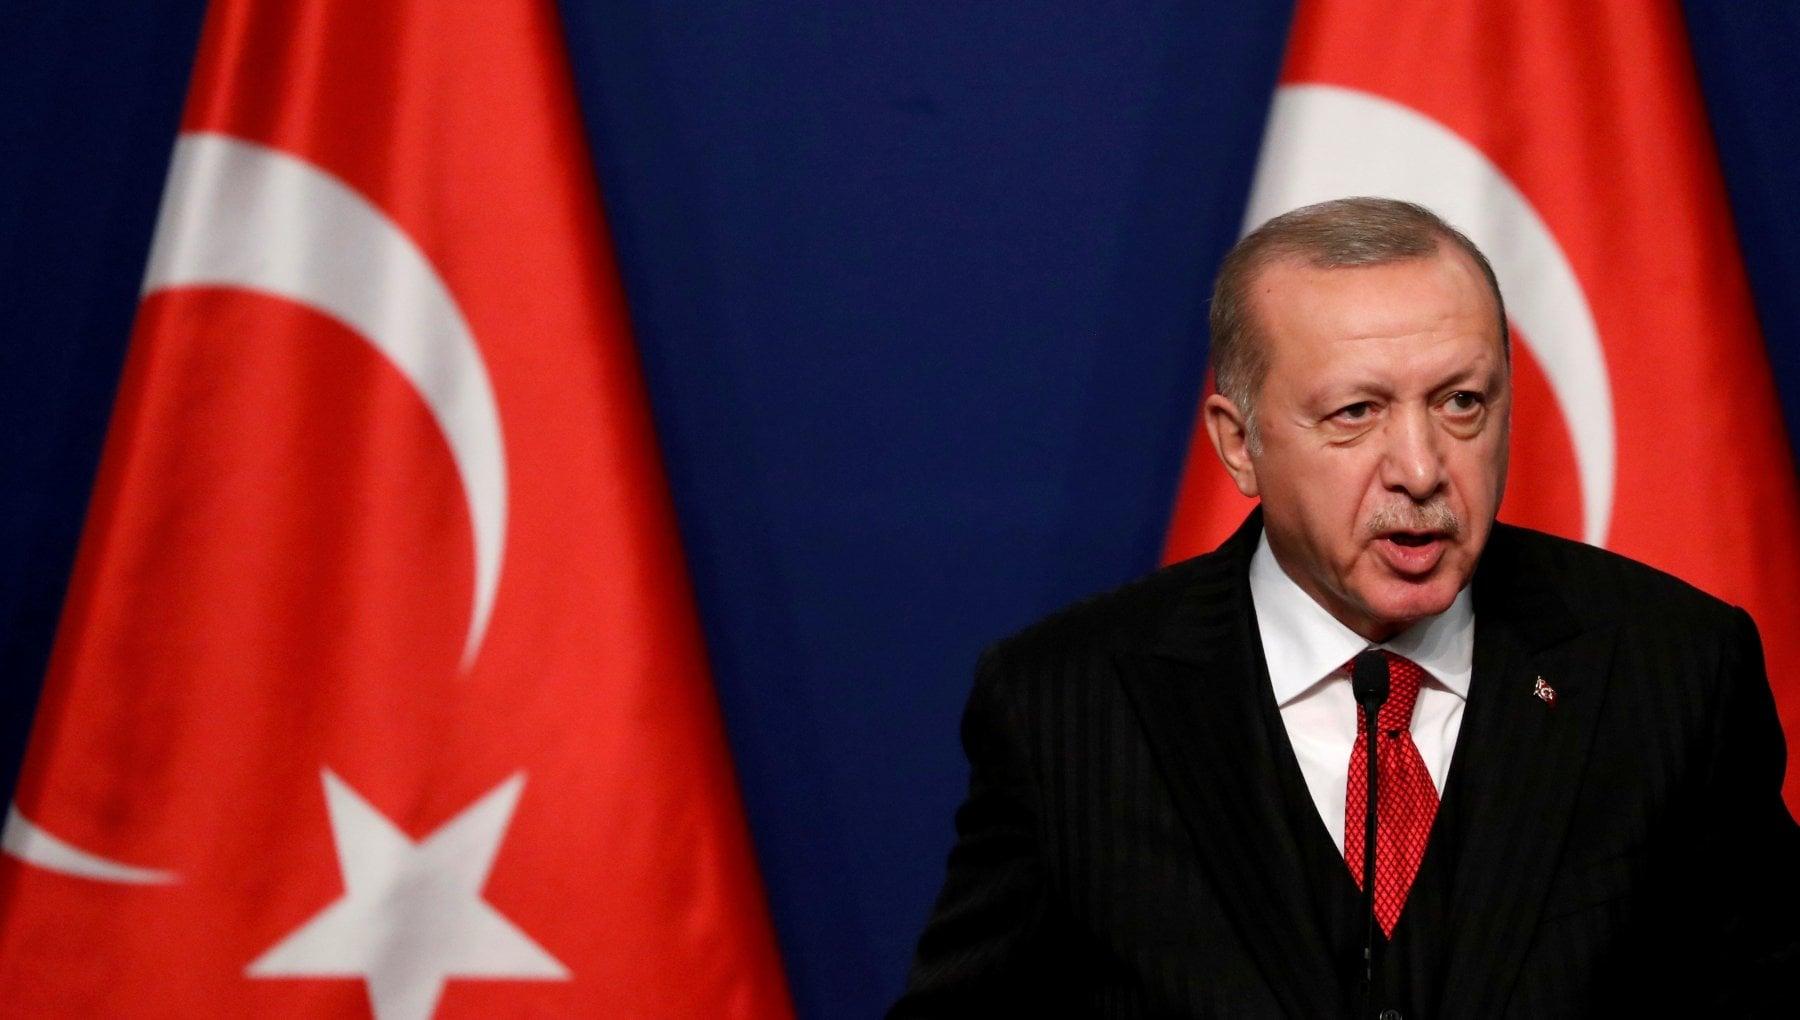 Turkey Seeks Cooperation with Egypt on Eastern Mediterranean, Libya